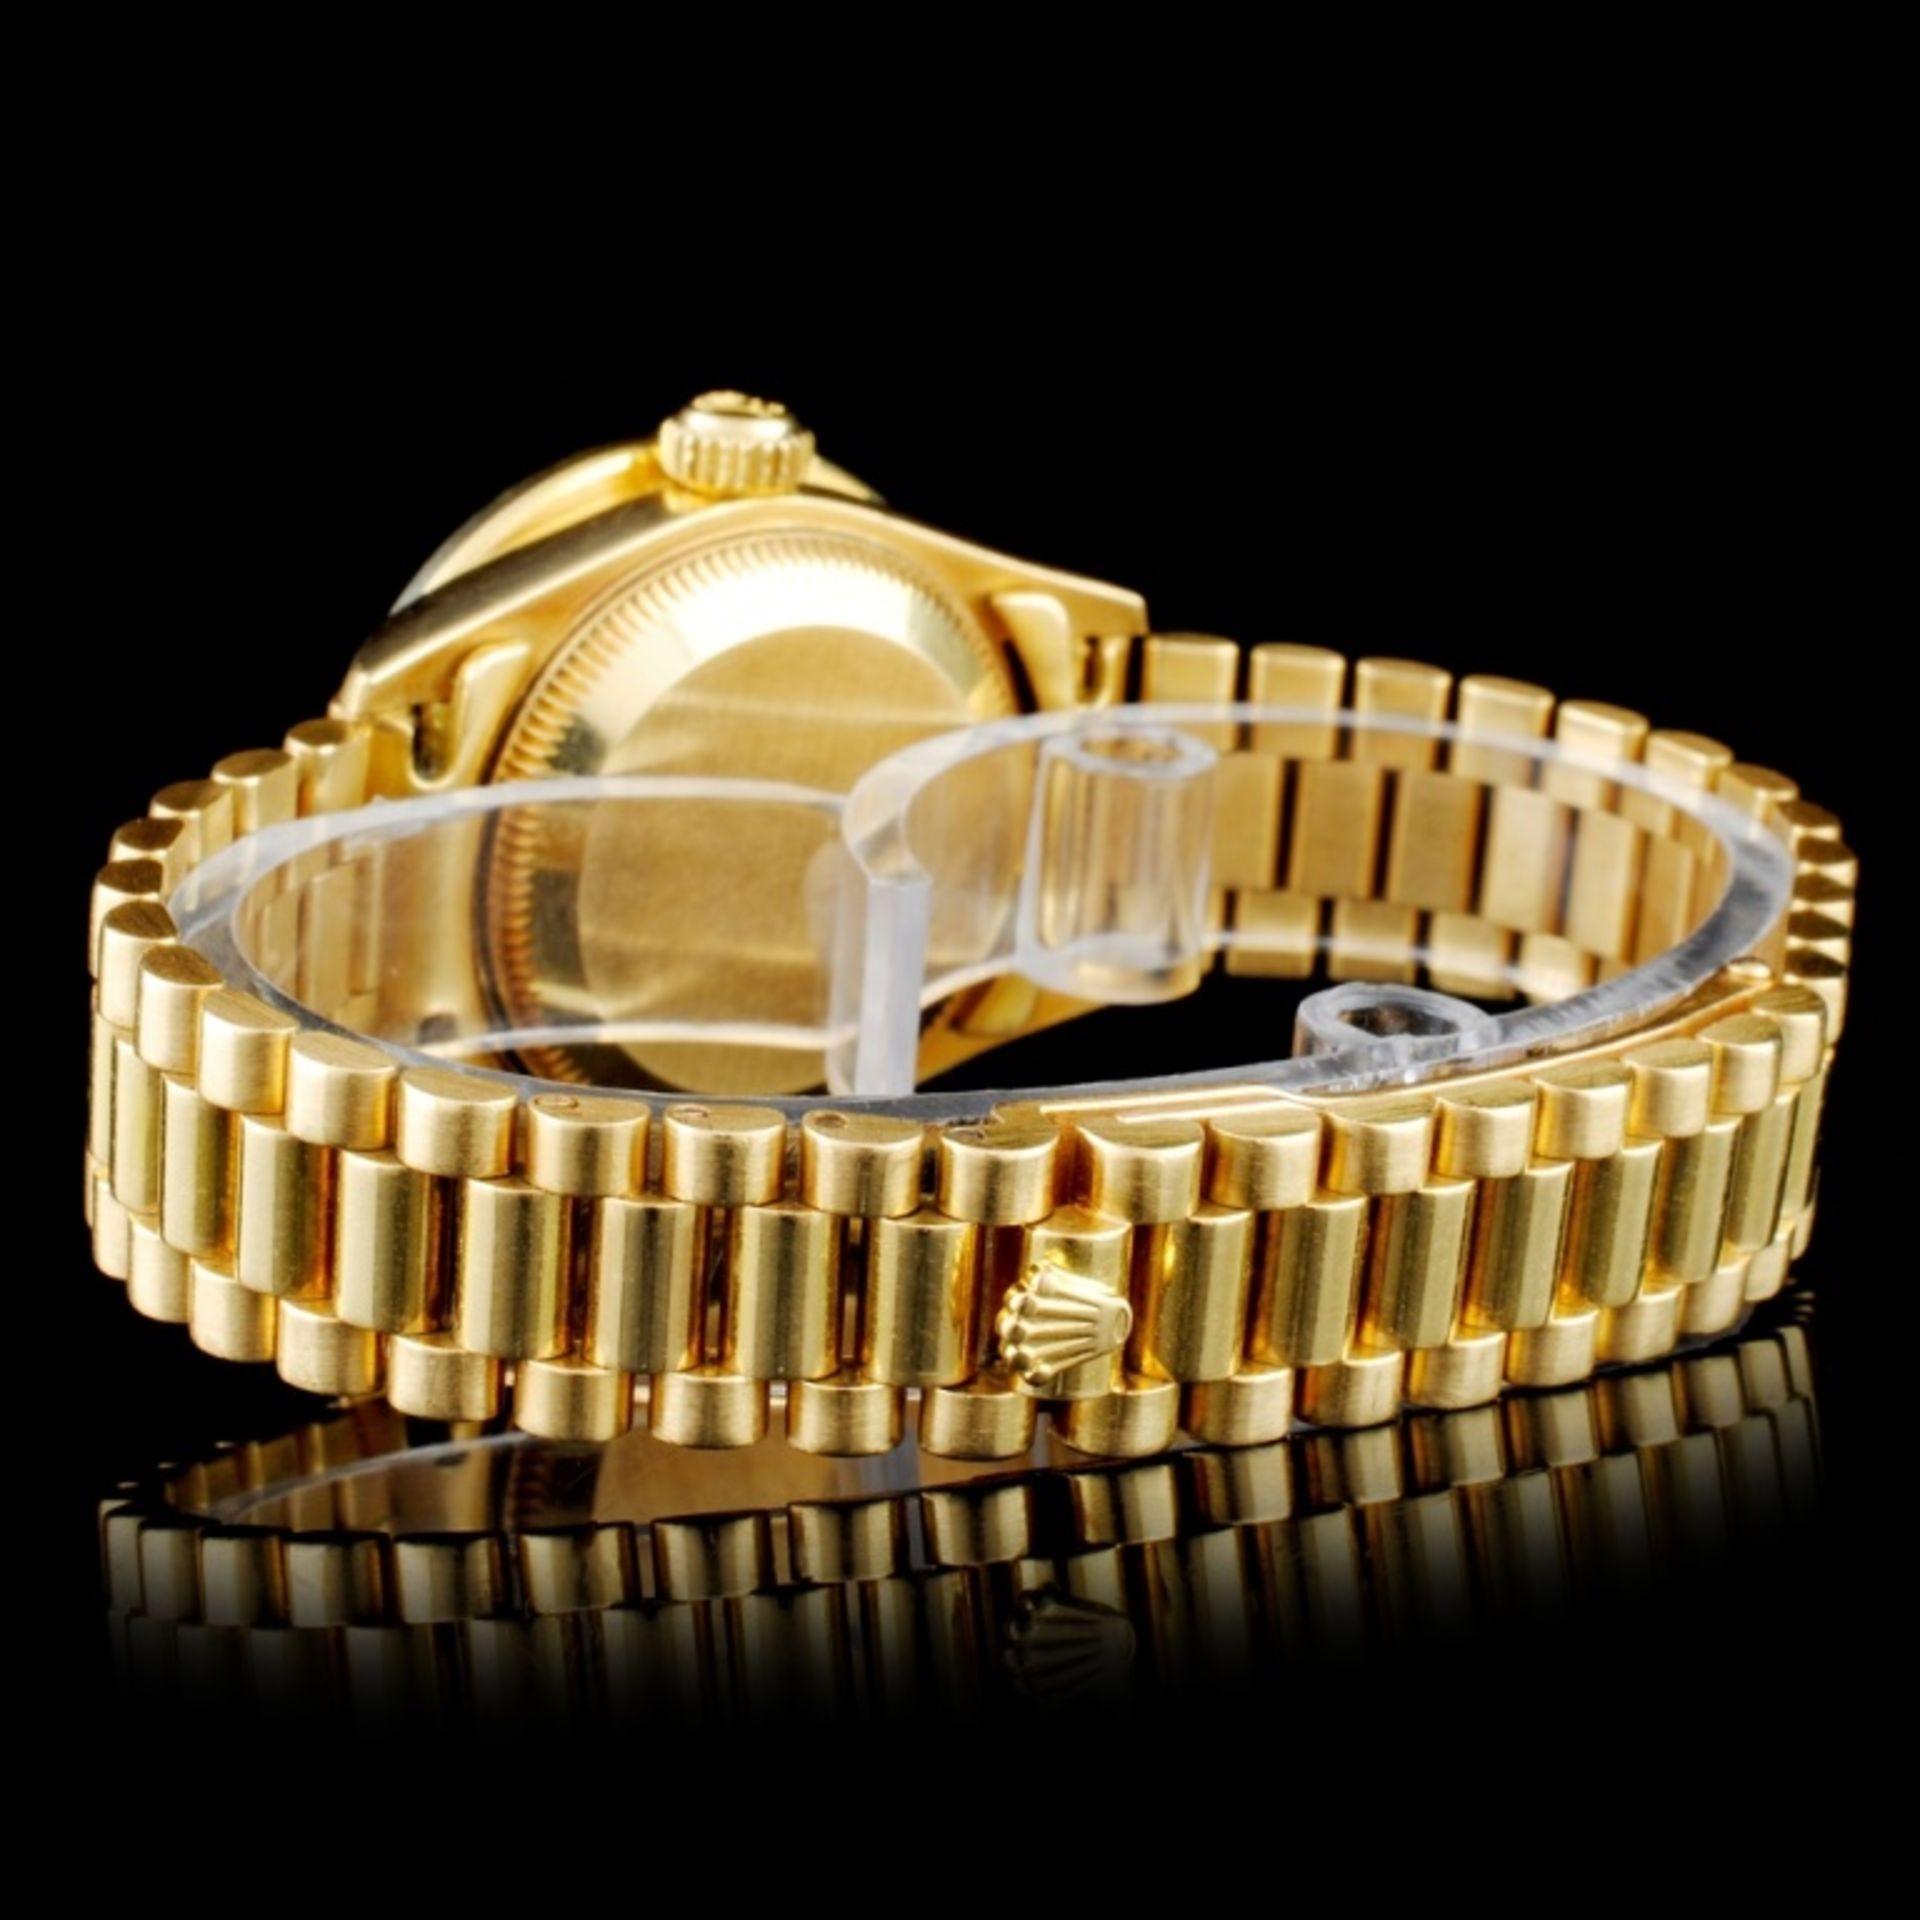 Rolex Presidential Diamond Ladies Watch - Image 3 of 5